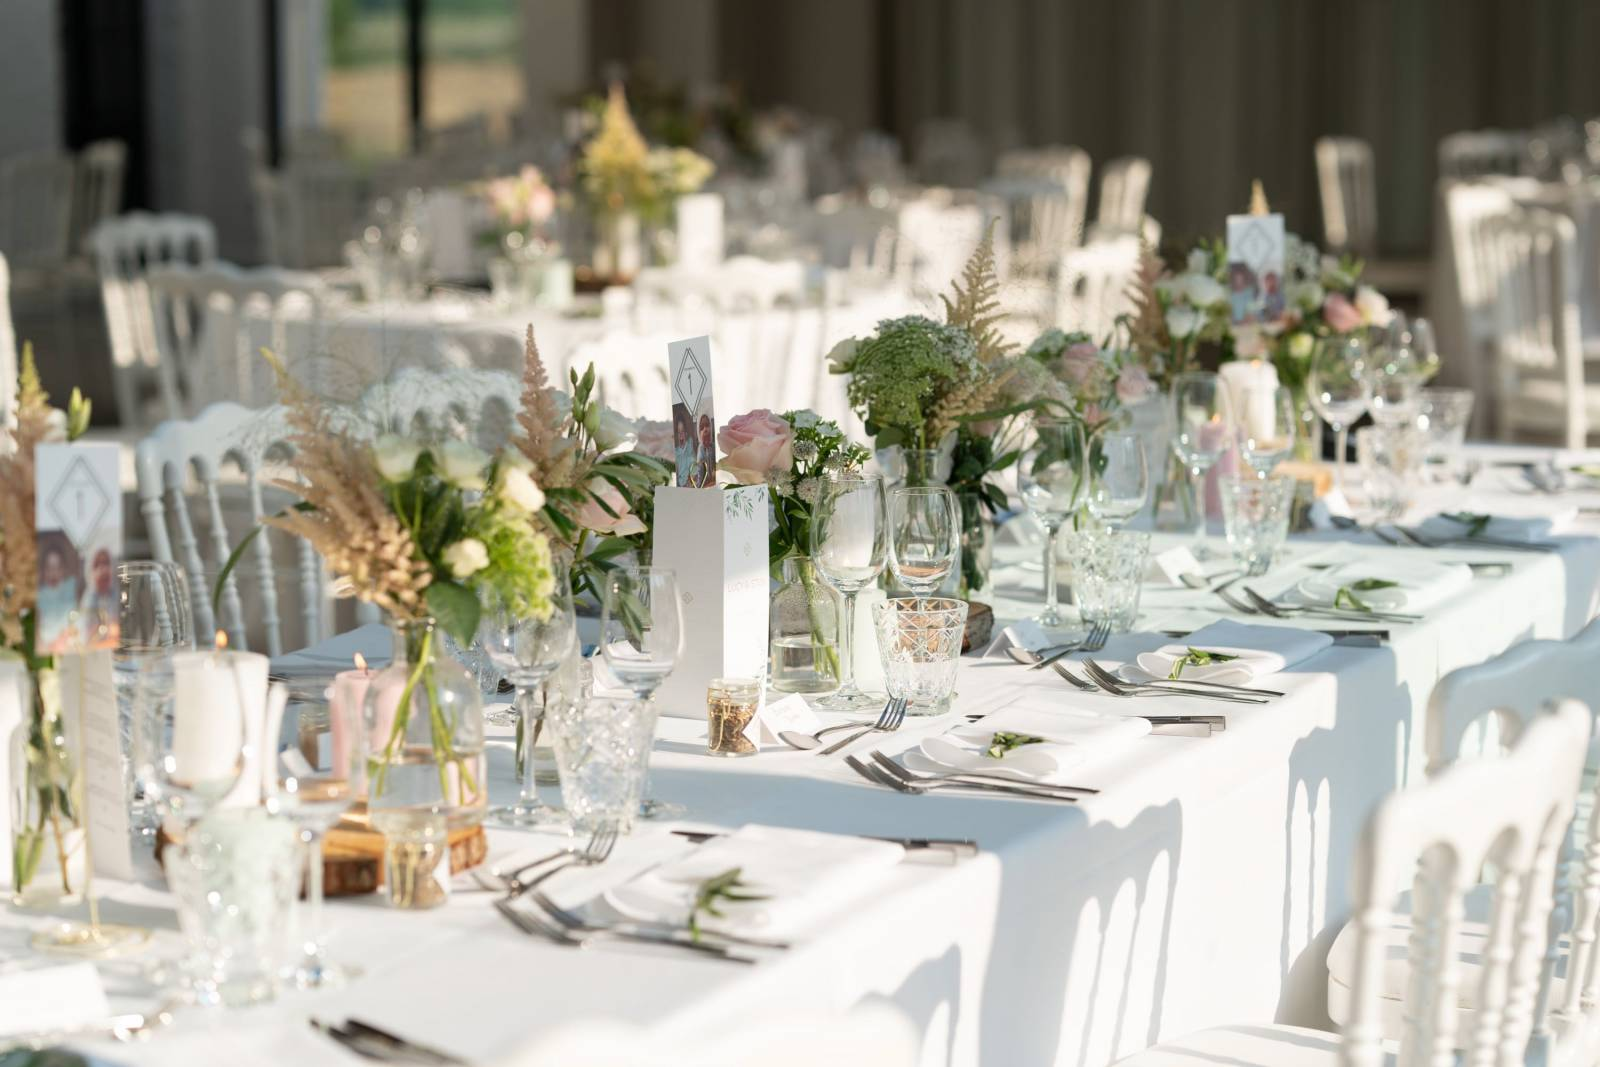 Lauren Bracke - Bruidsmake-up - Bruidskapsel - Nagels - House of Weddings - 6